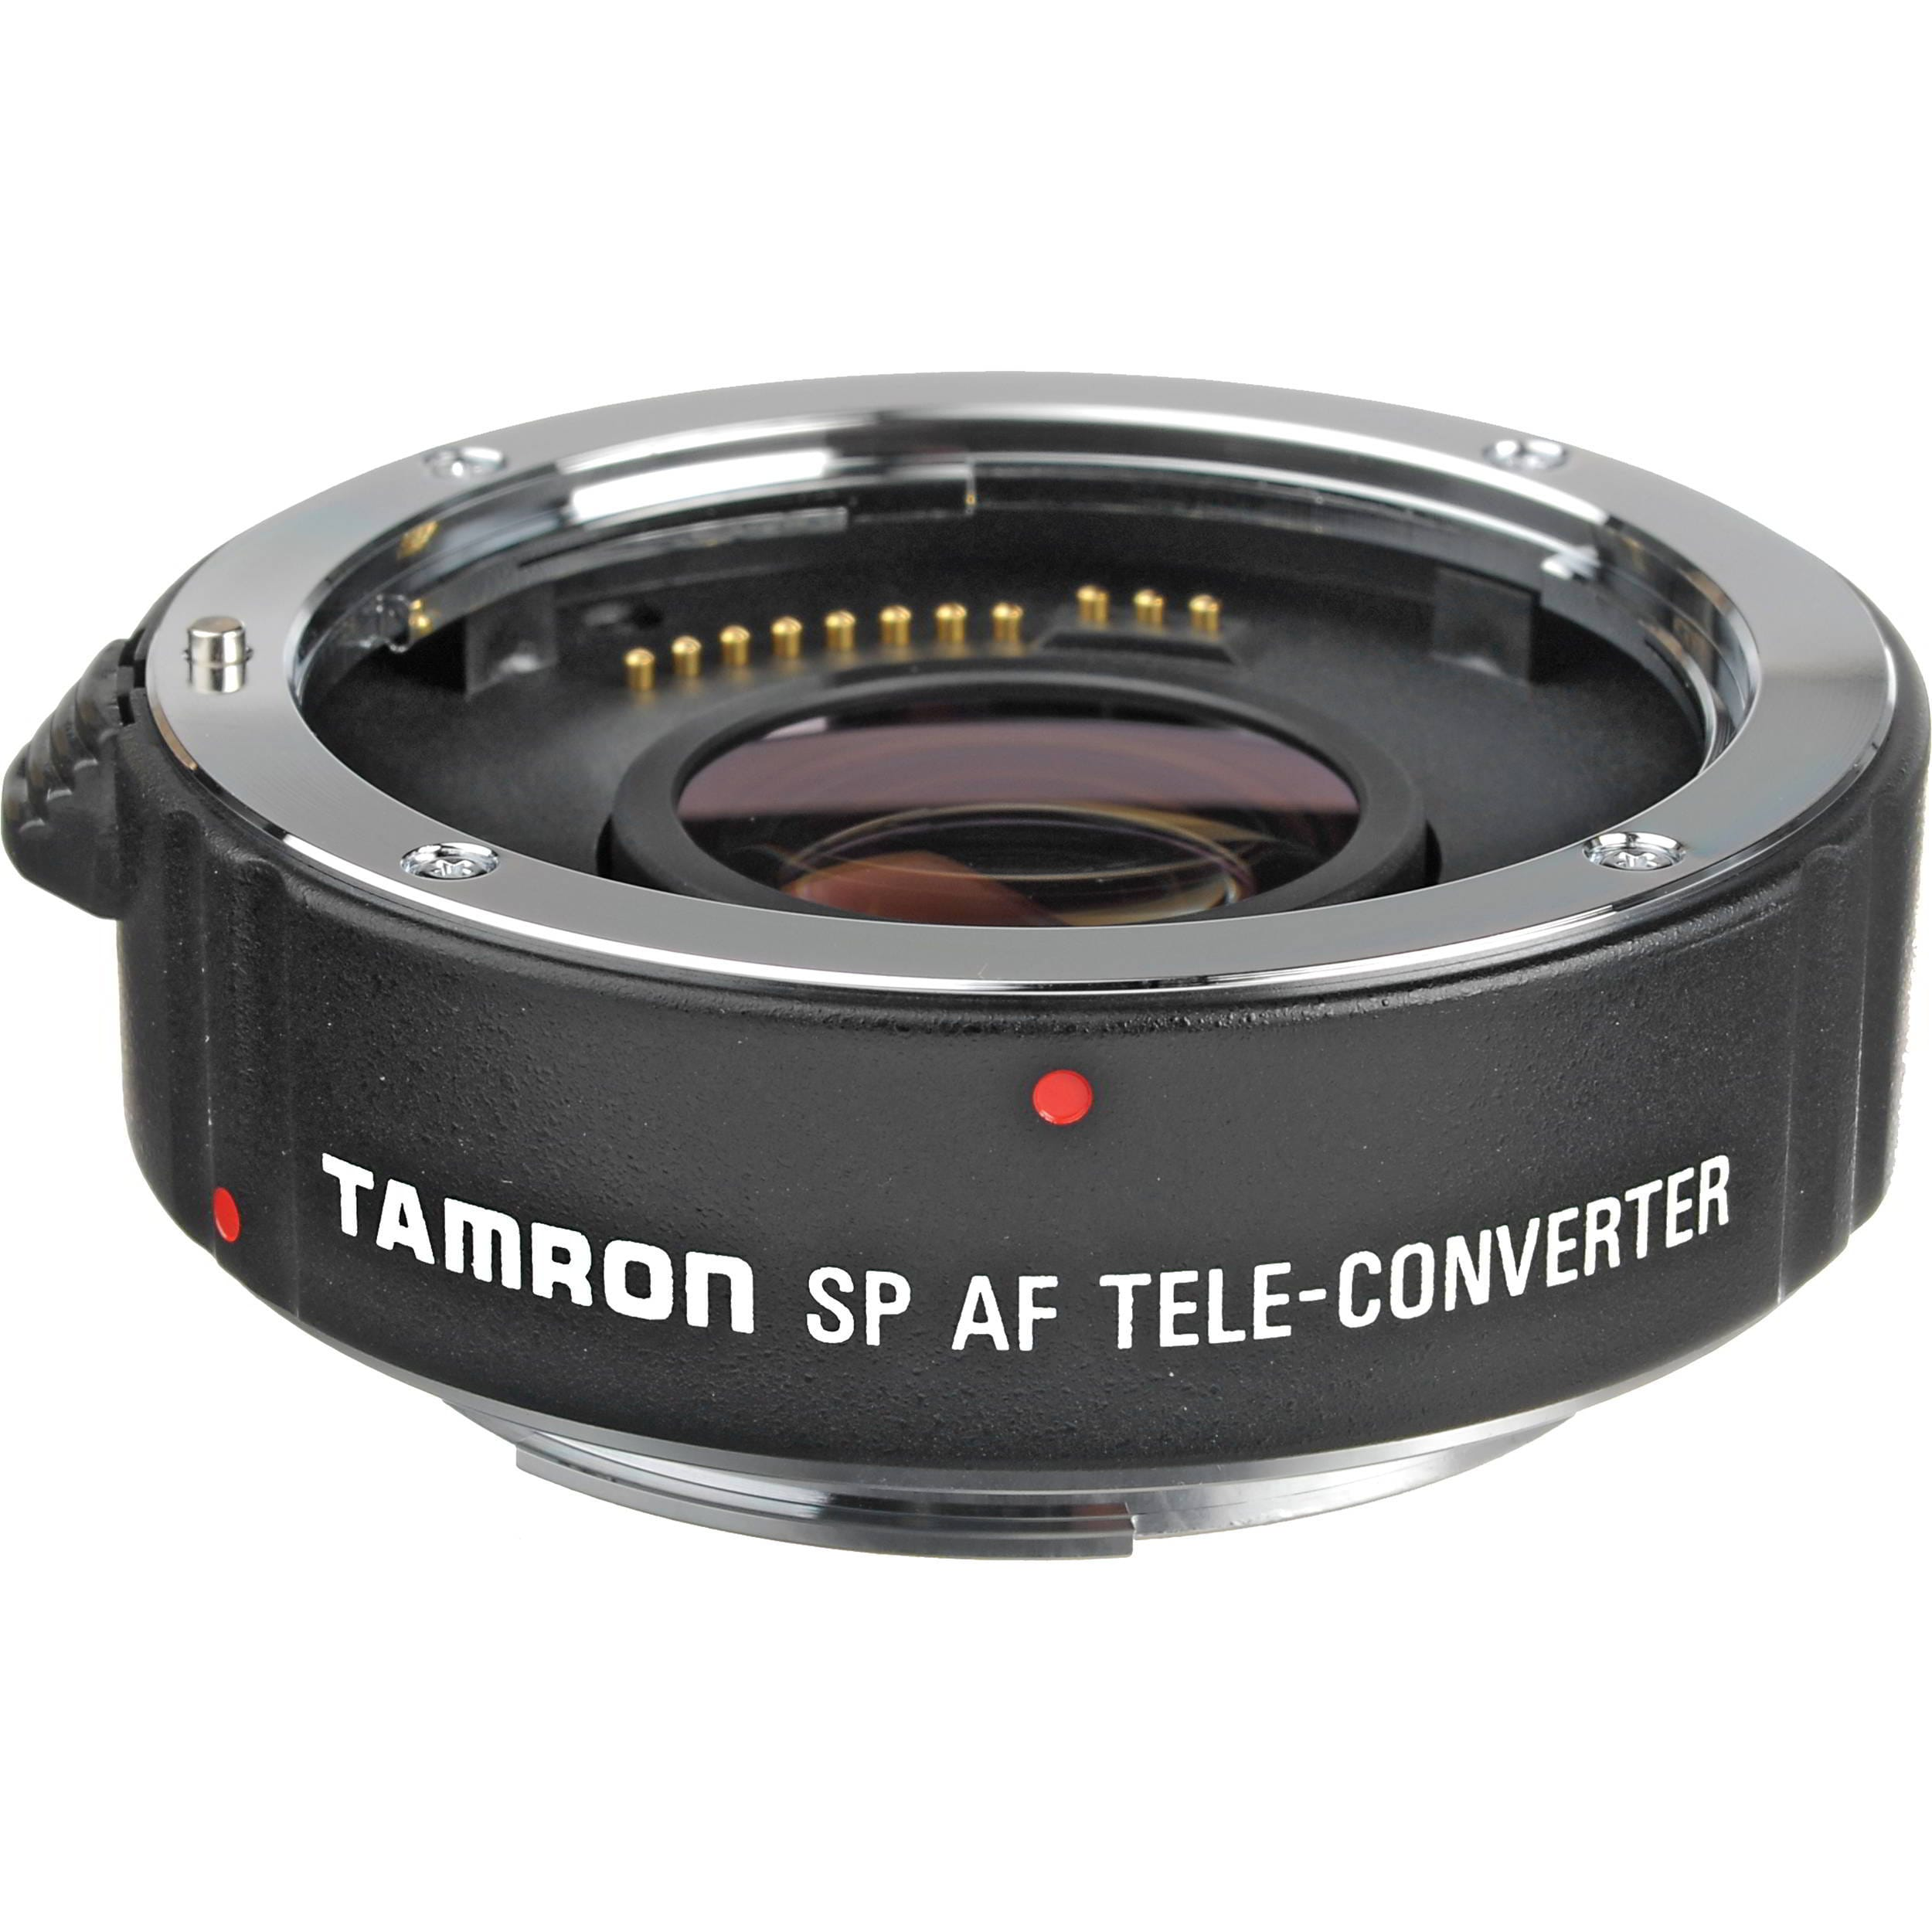 Tele Converter 1,4x for Canon